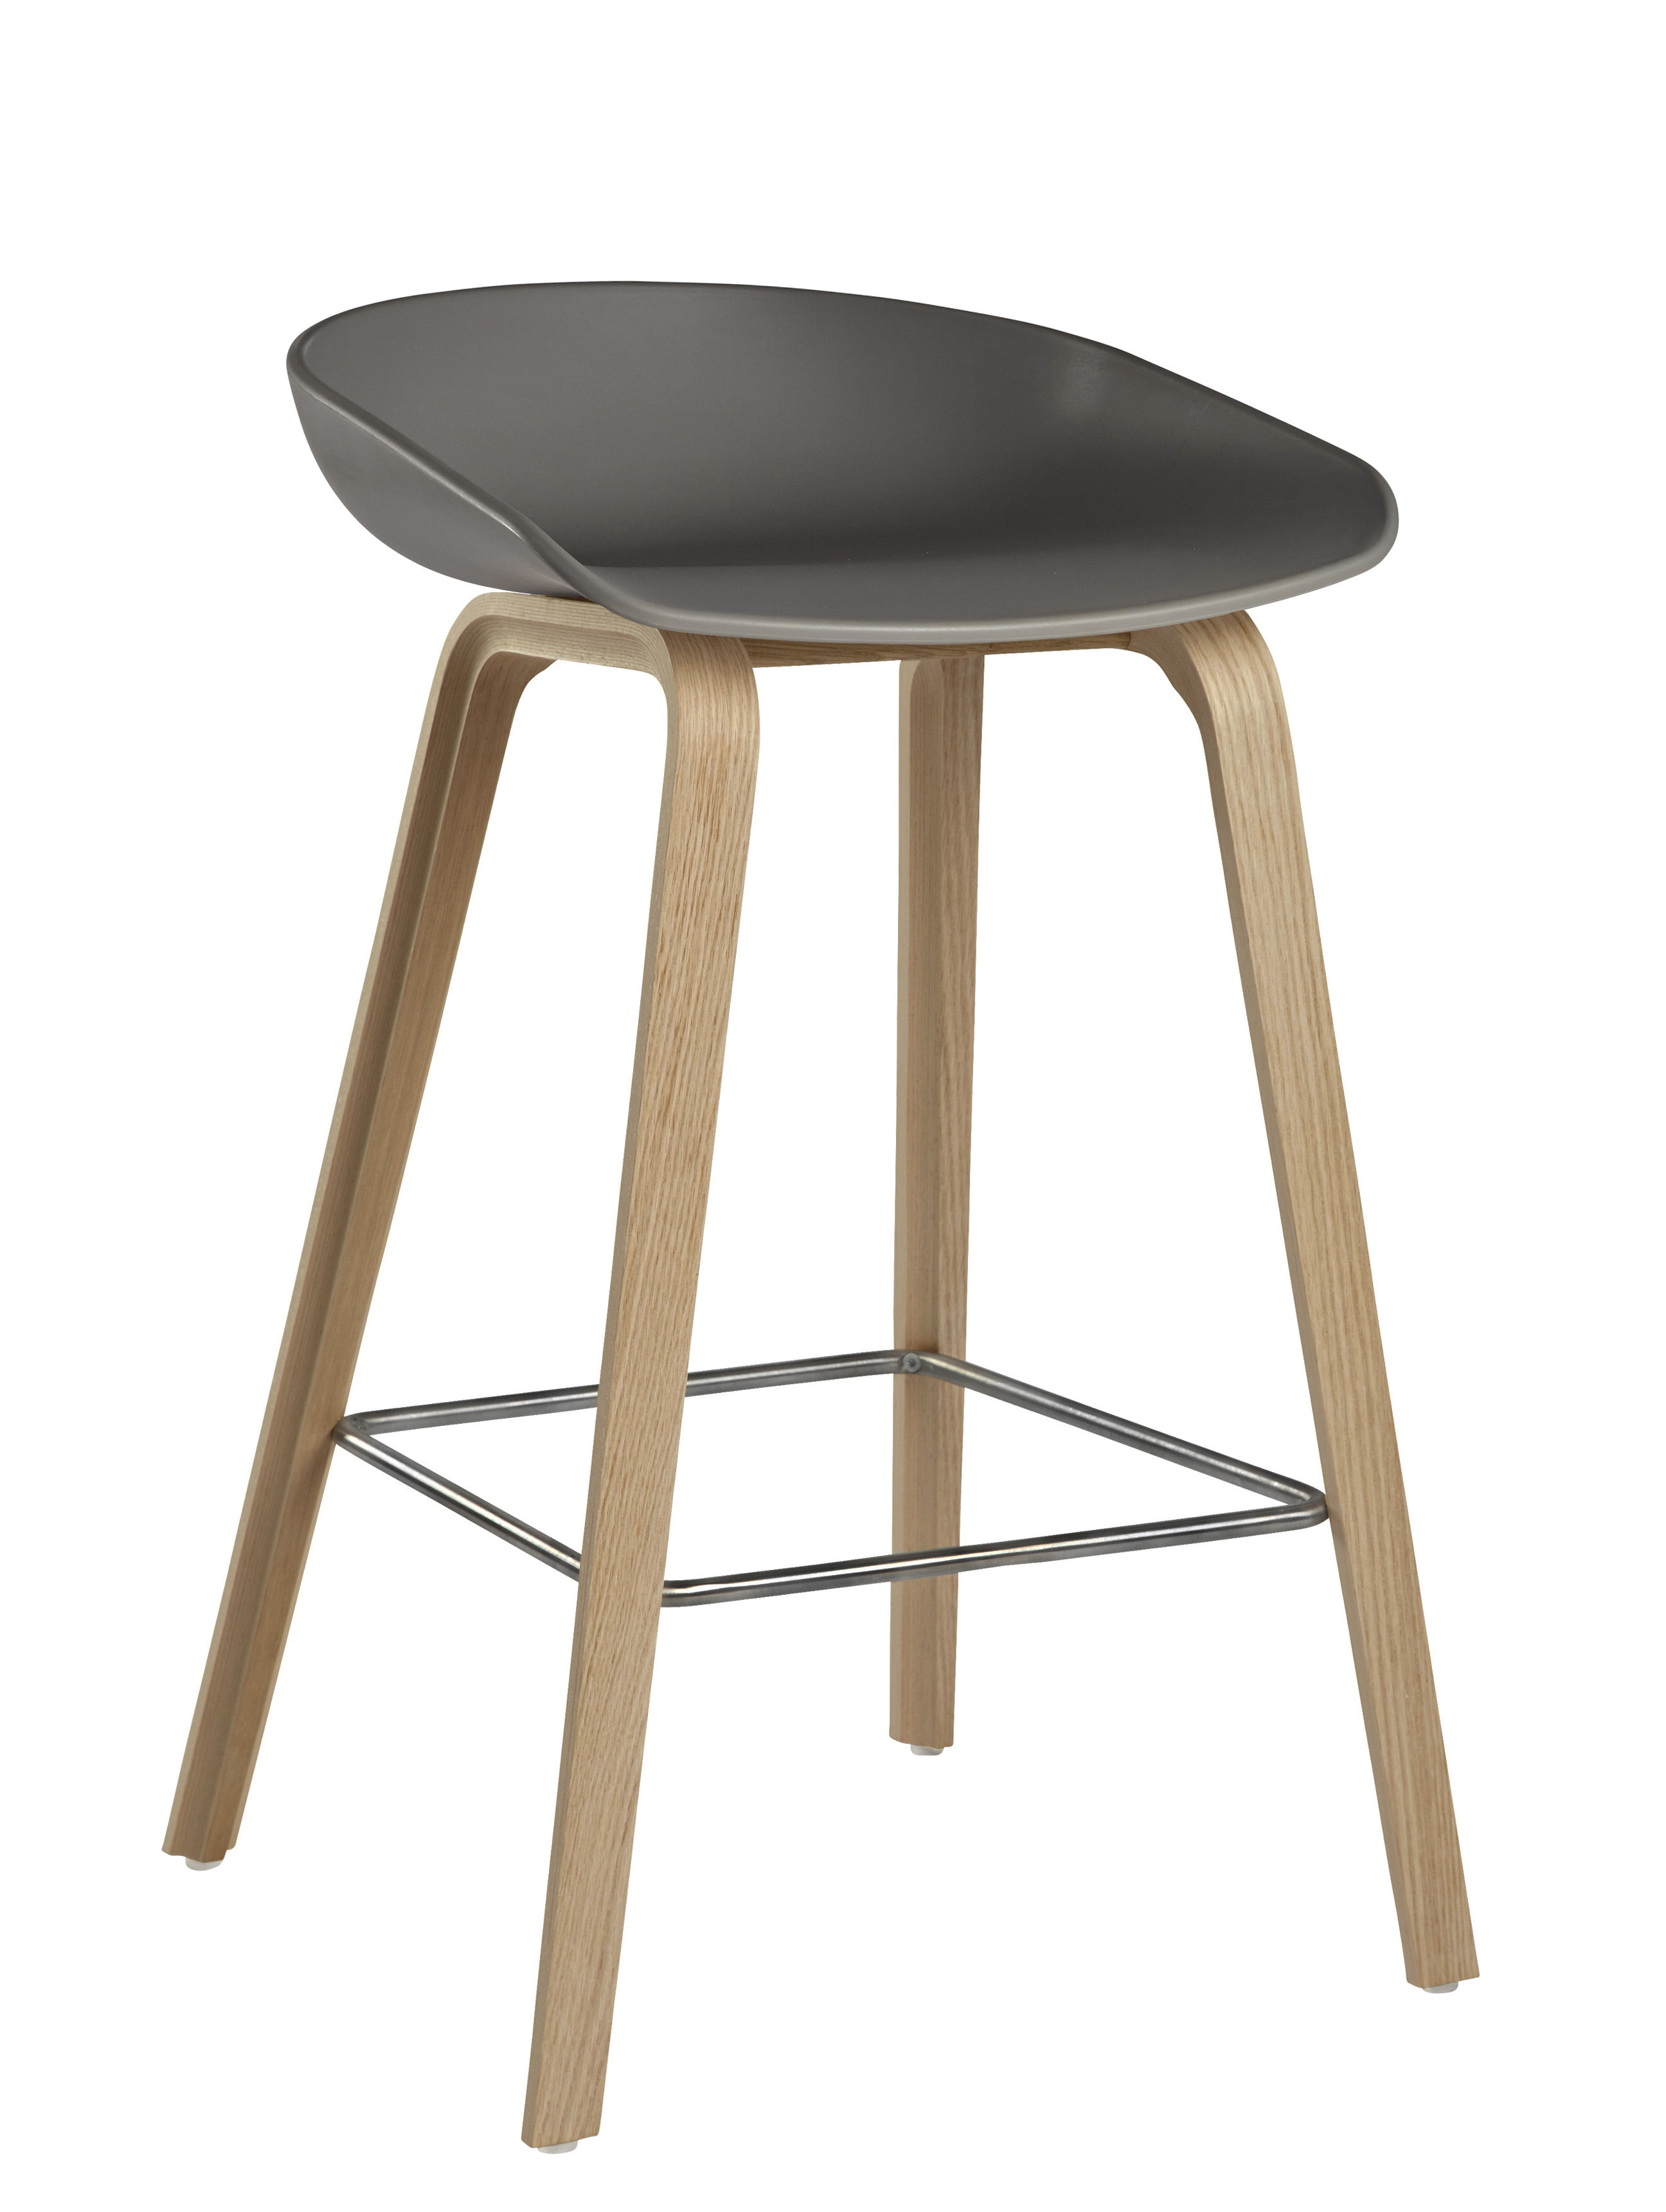 Furniture - Bar Stools - About a stool AAS 32 Bar stool - H 65 cm - Plastic & wood legs by Hay - Grey / Natural wood legs - Oak, Polypropylene